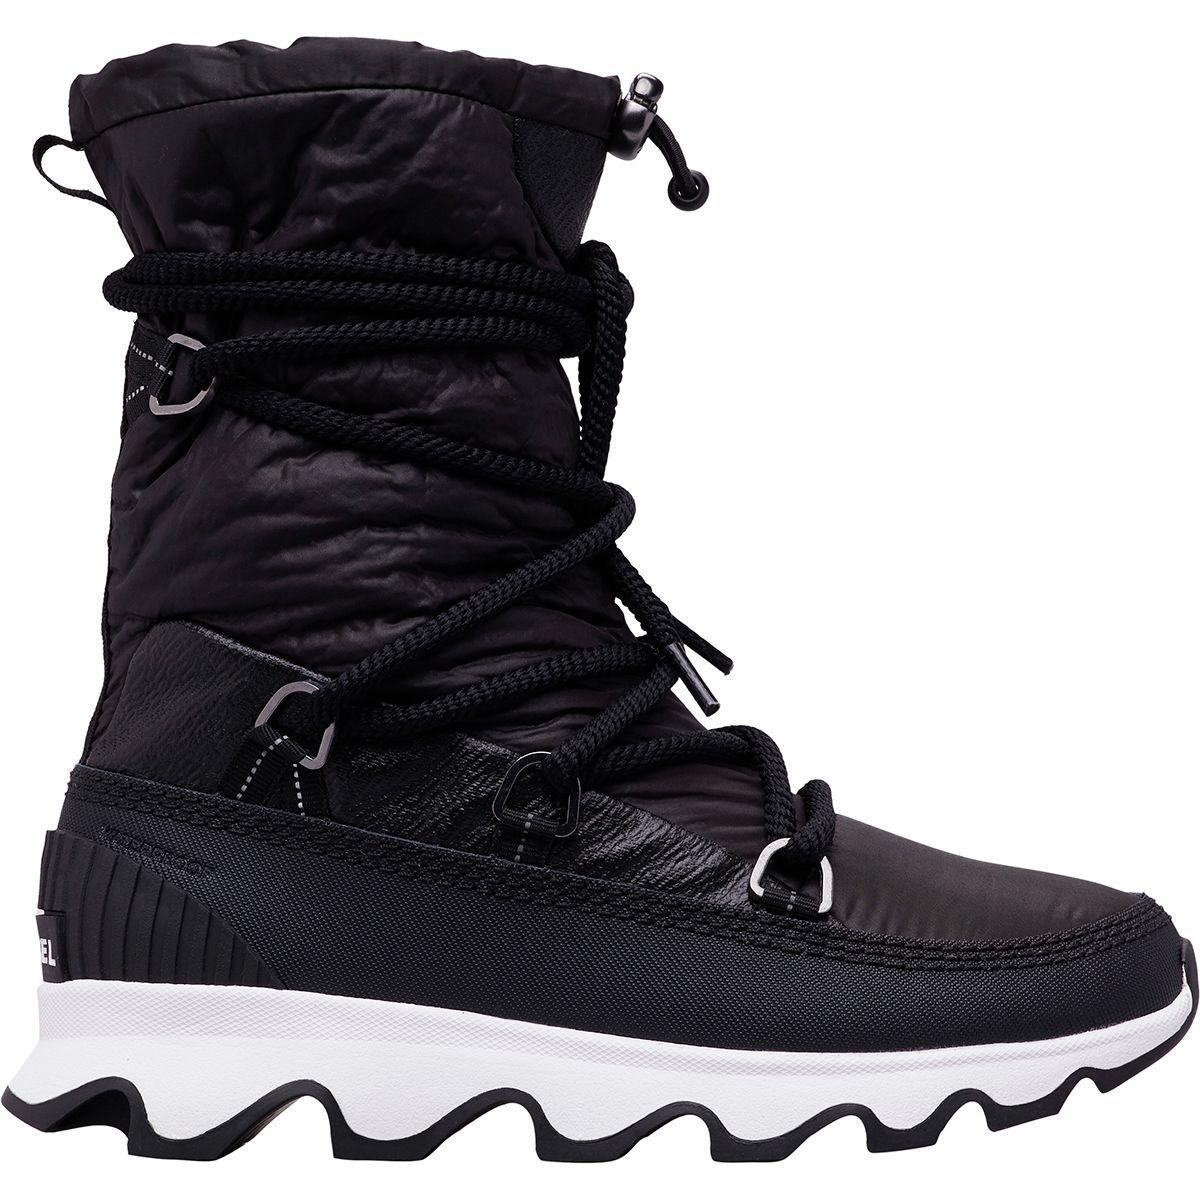 Photo of Women's Winter Boots